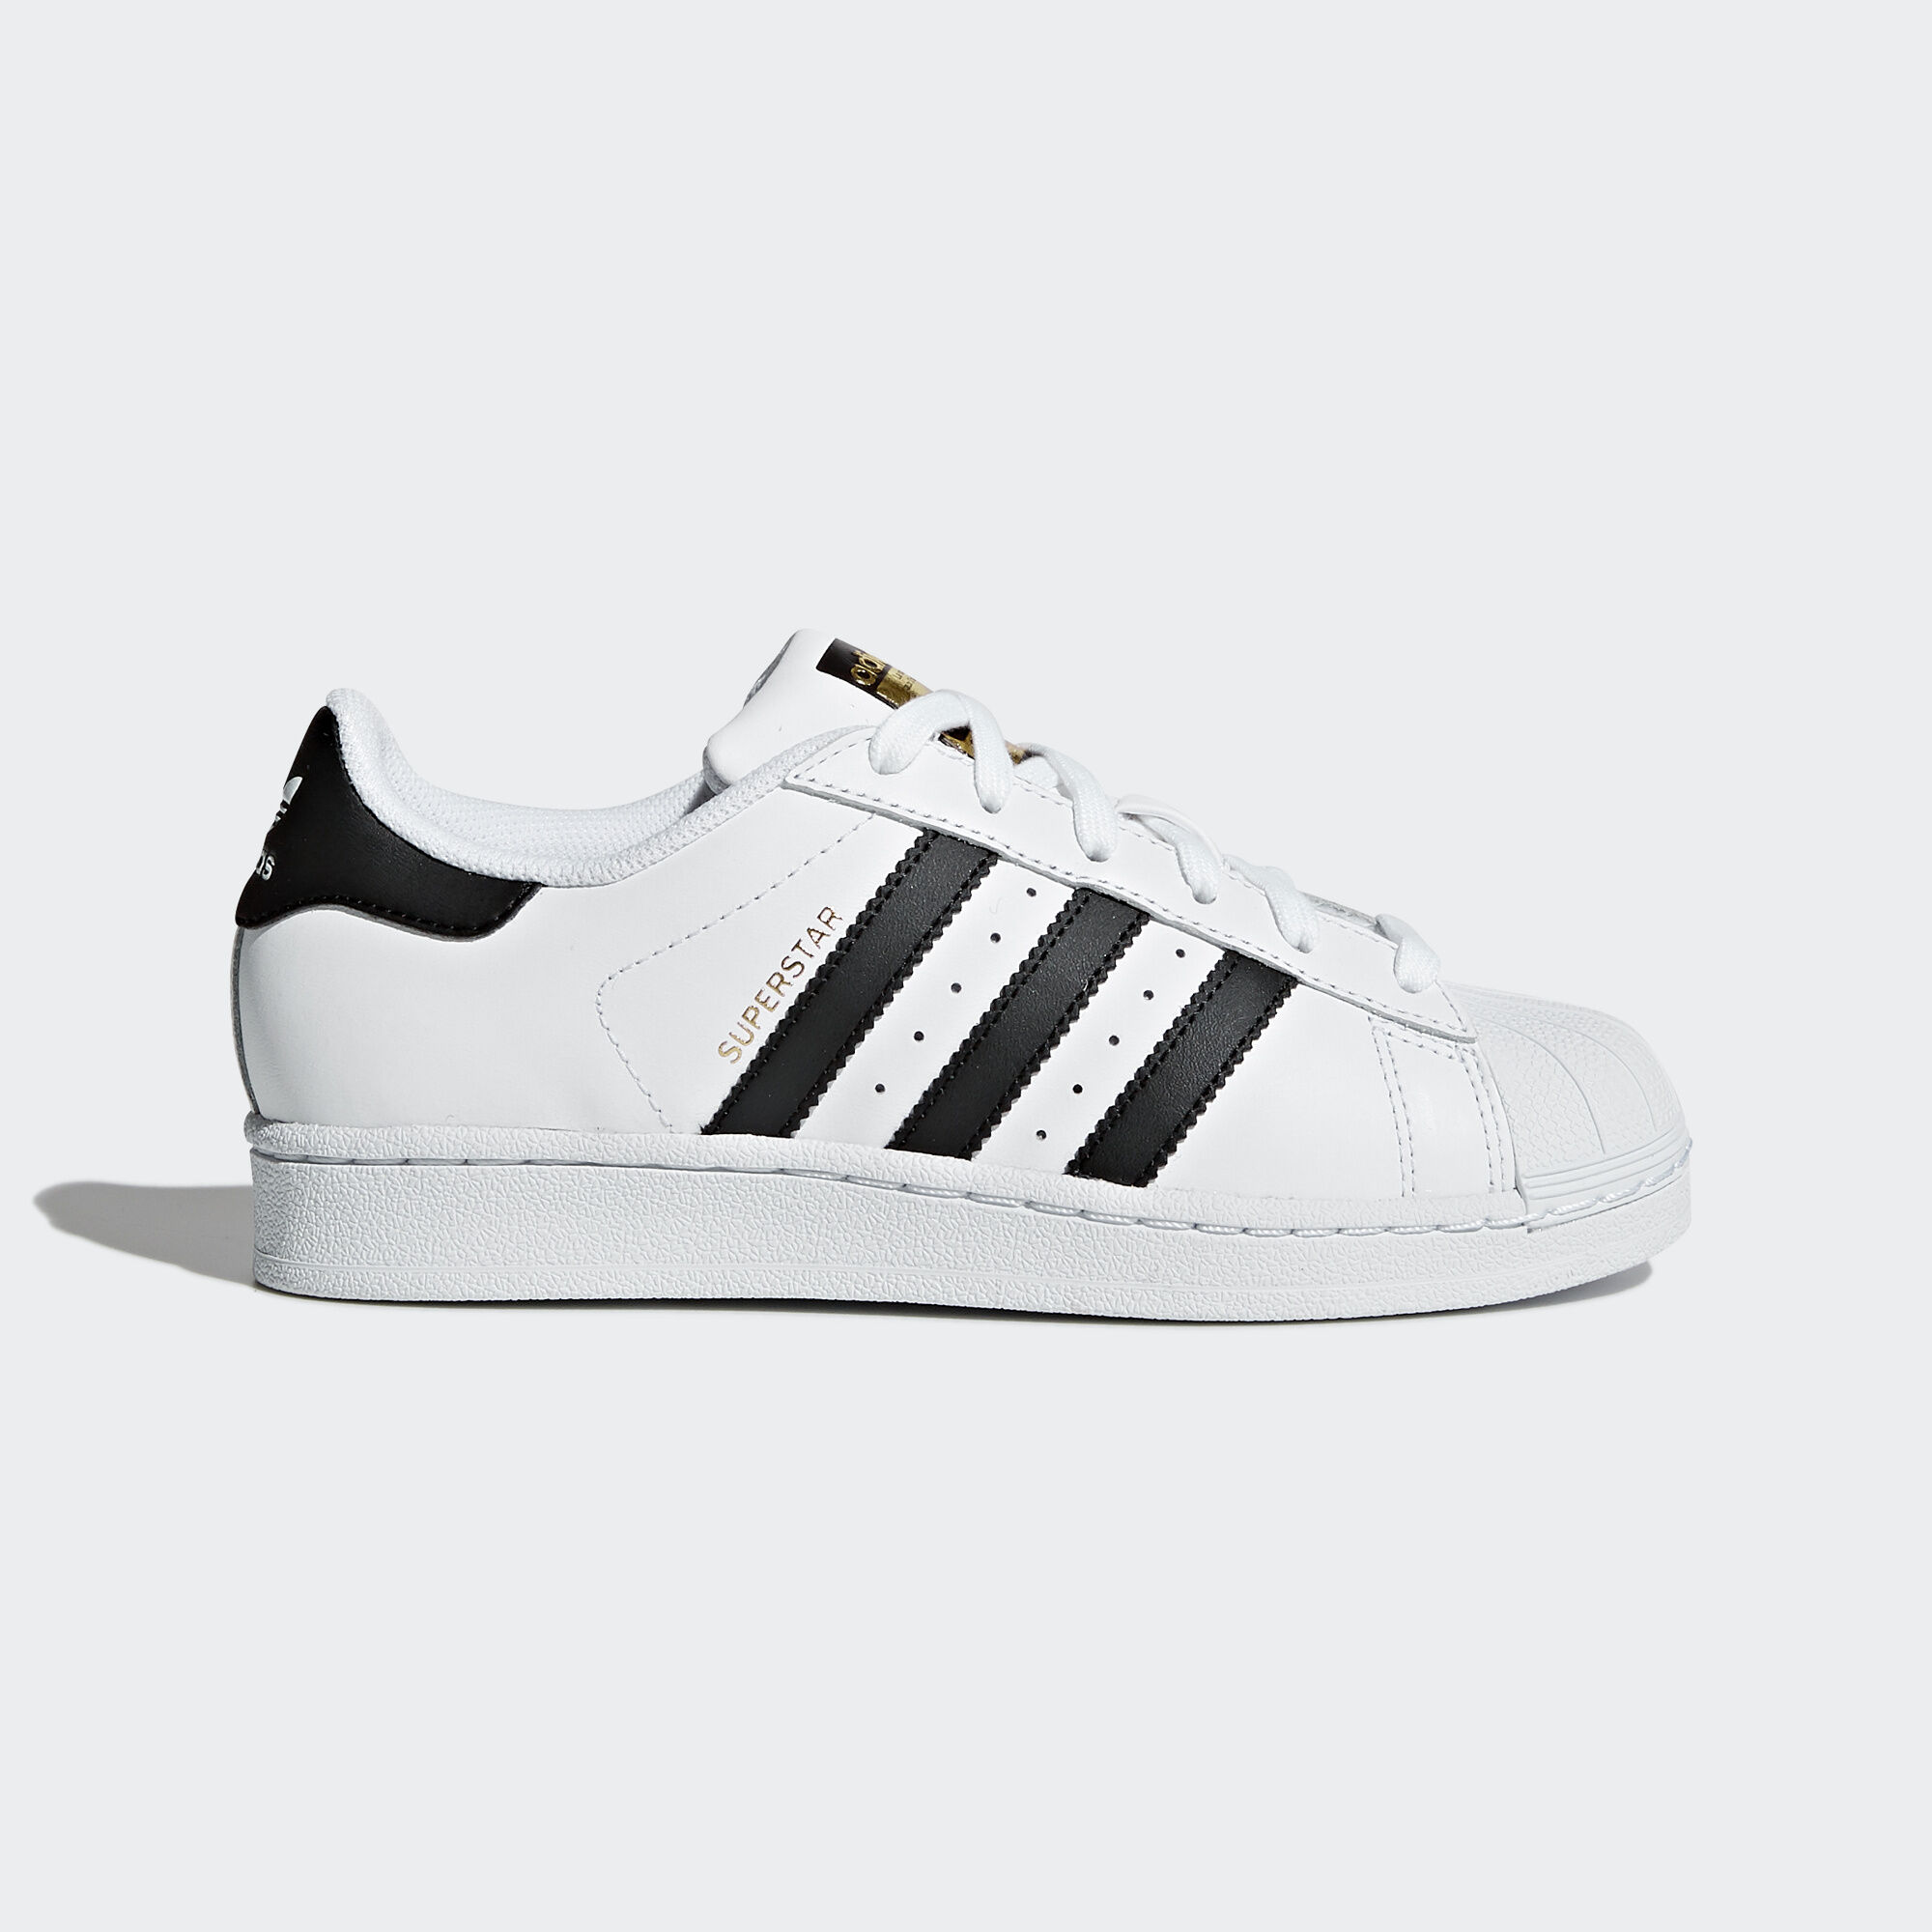 Adidas All Star White